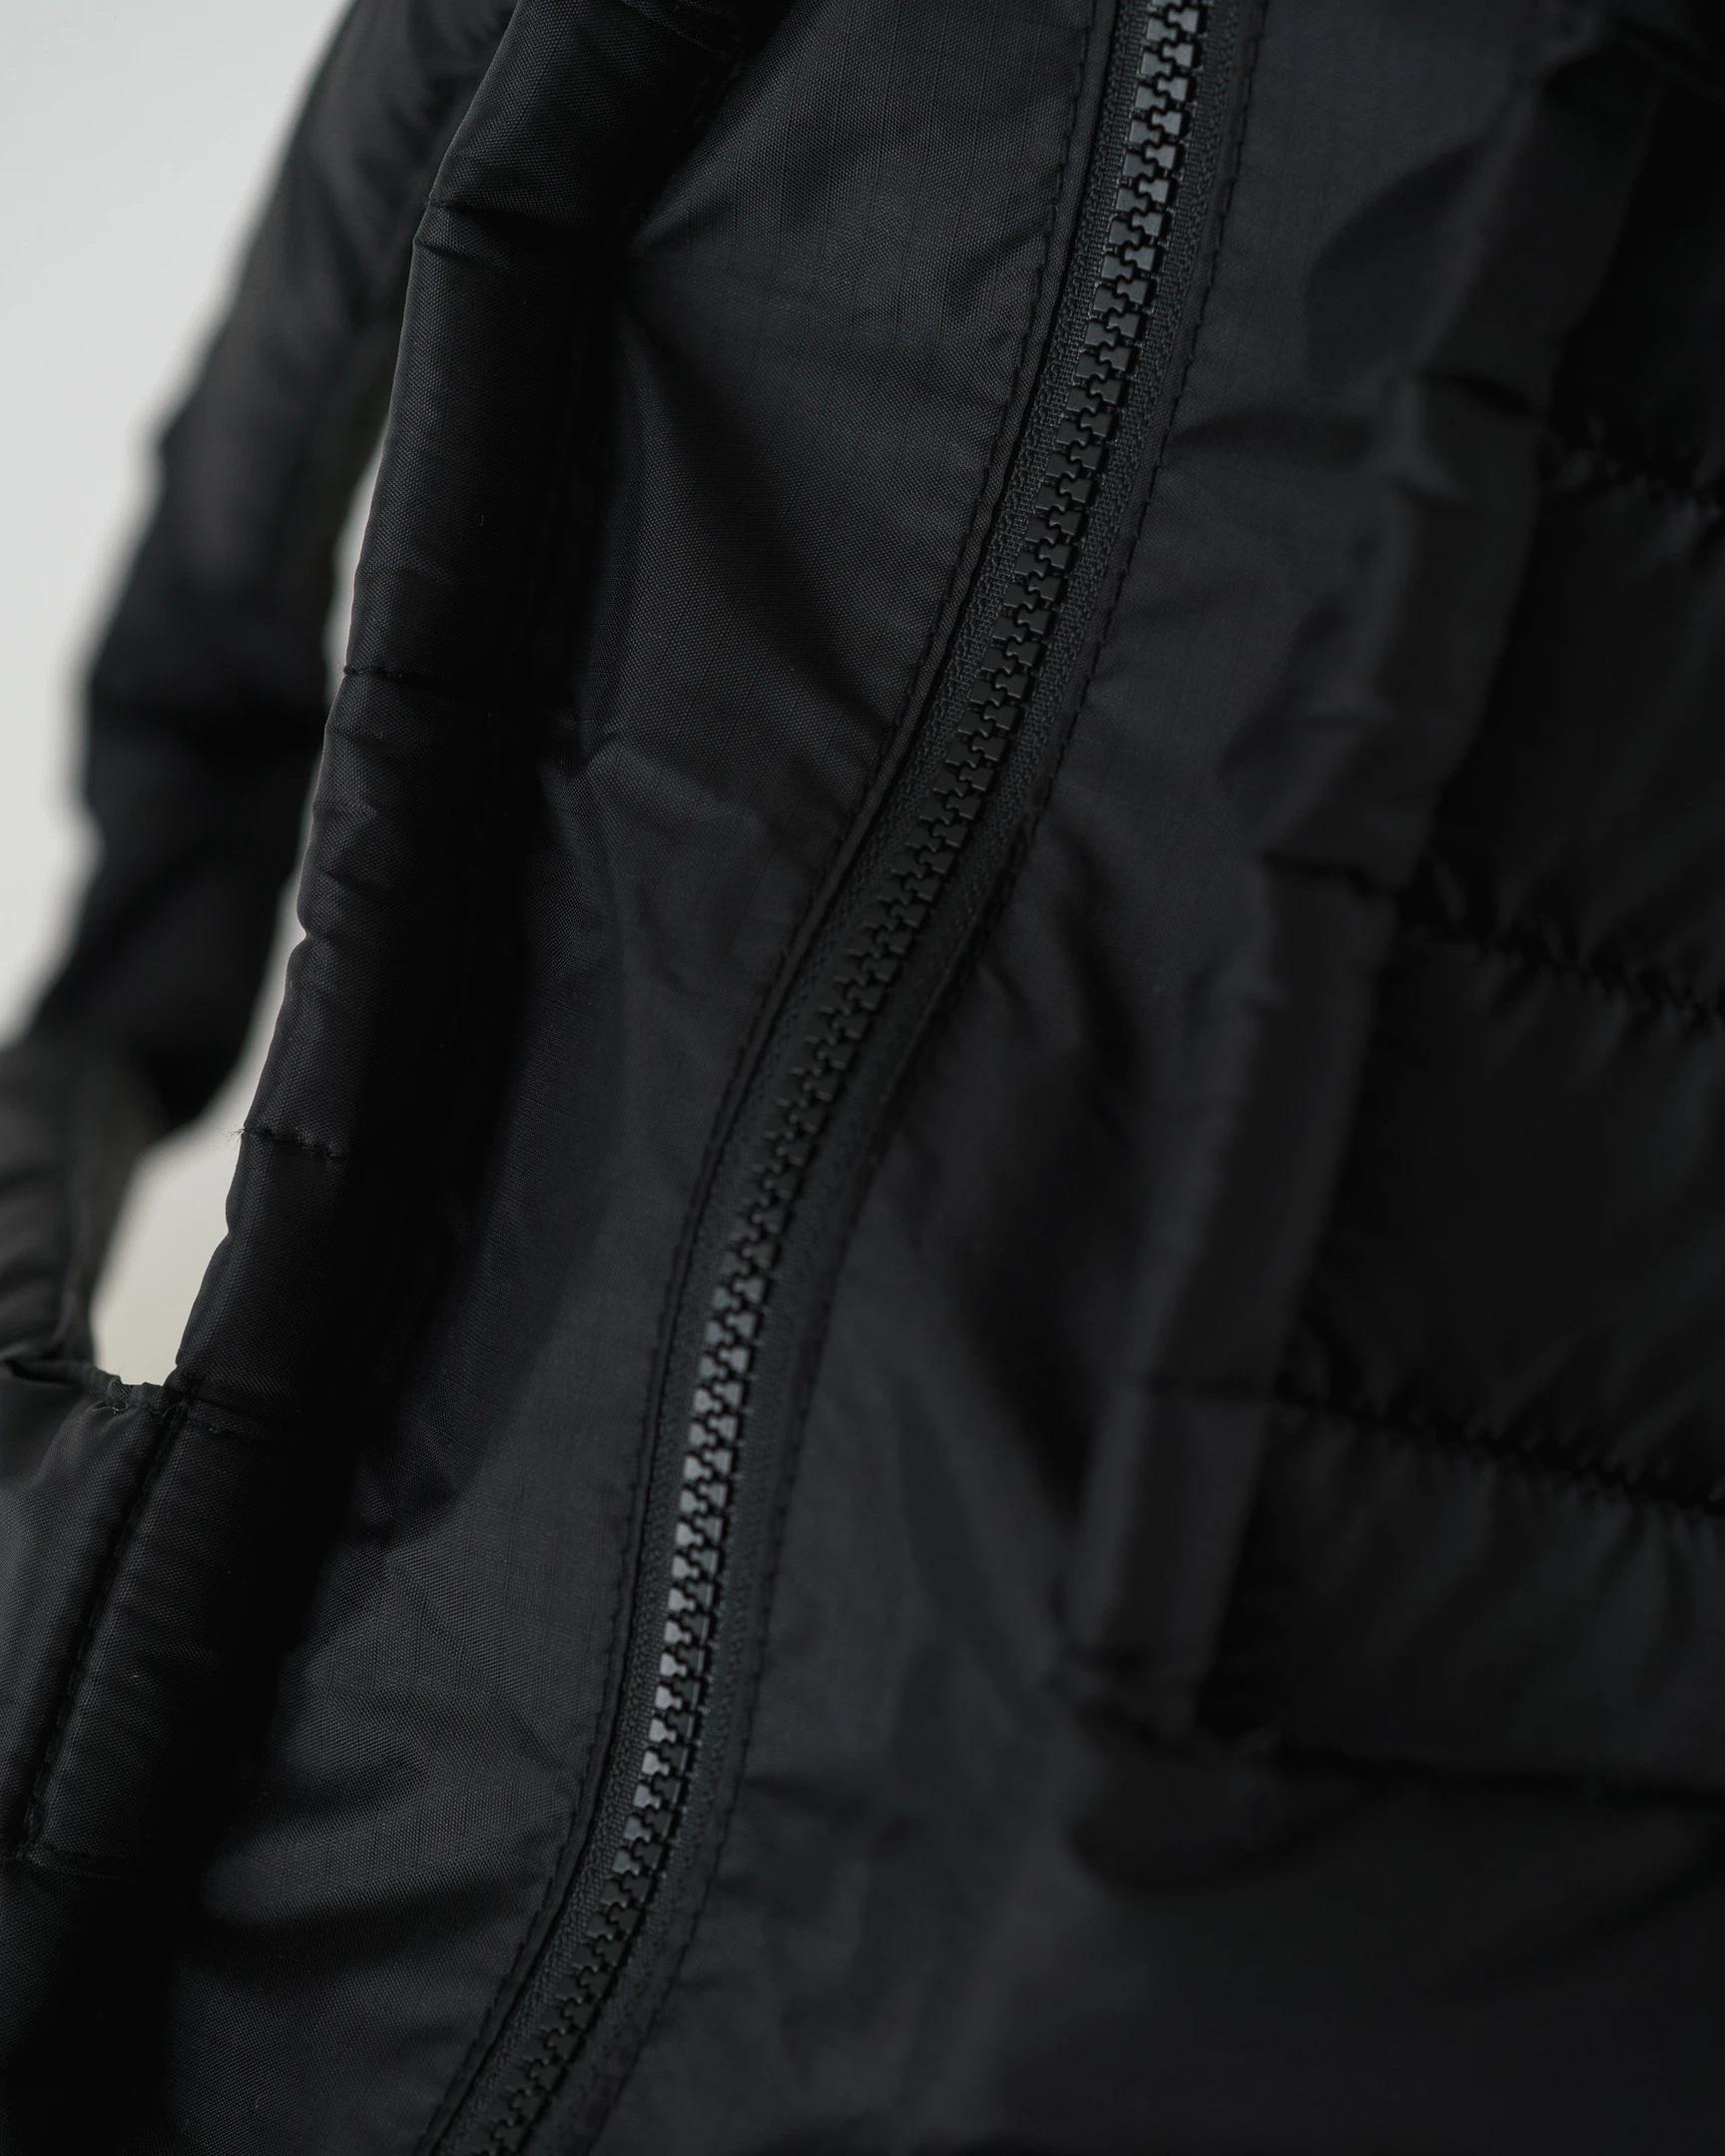 BAGGU - Puffy Tote Bag Black